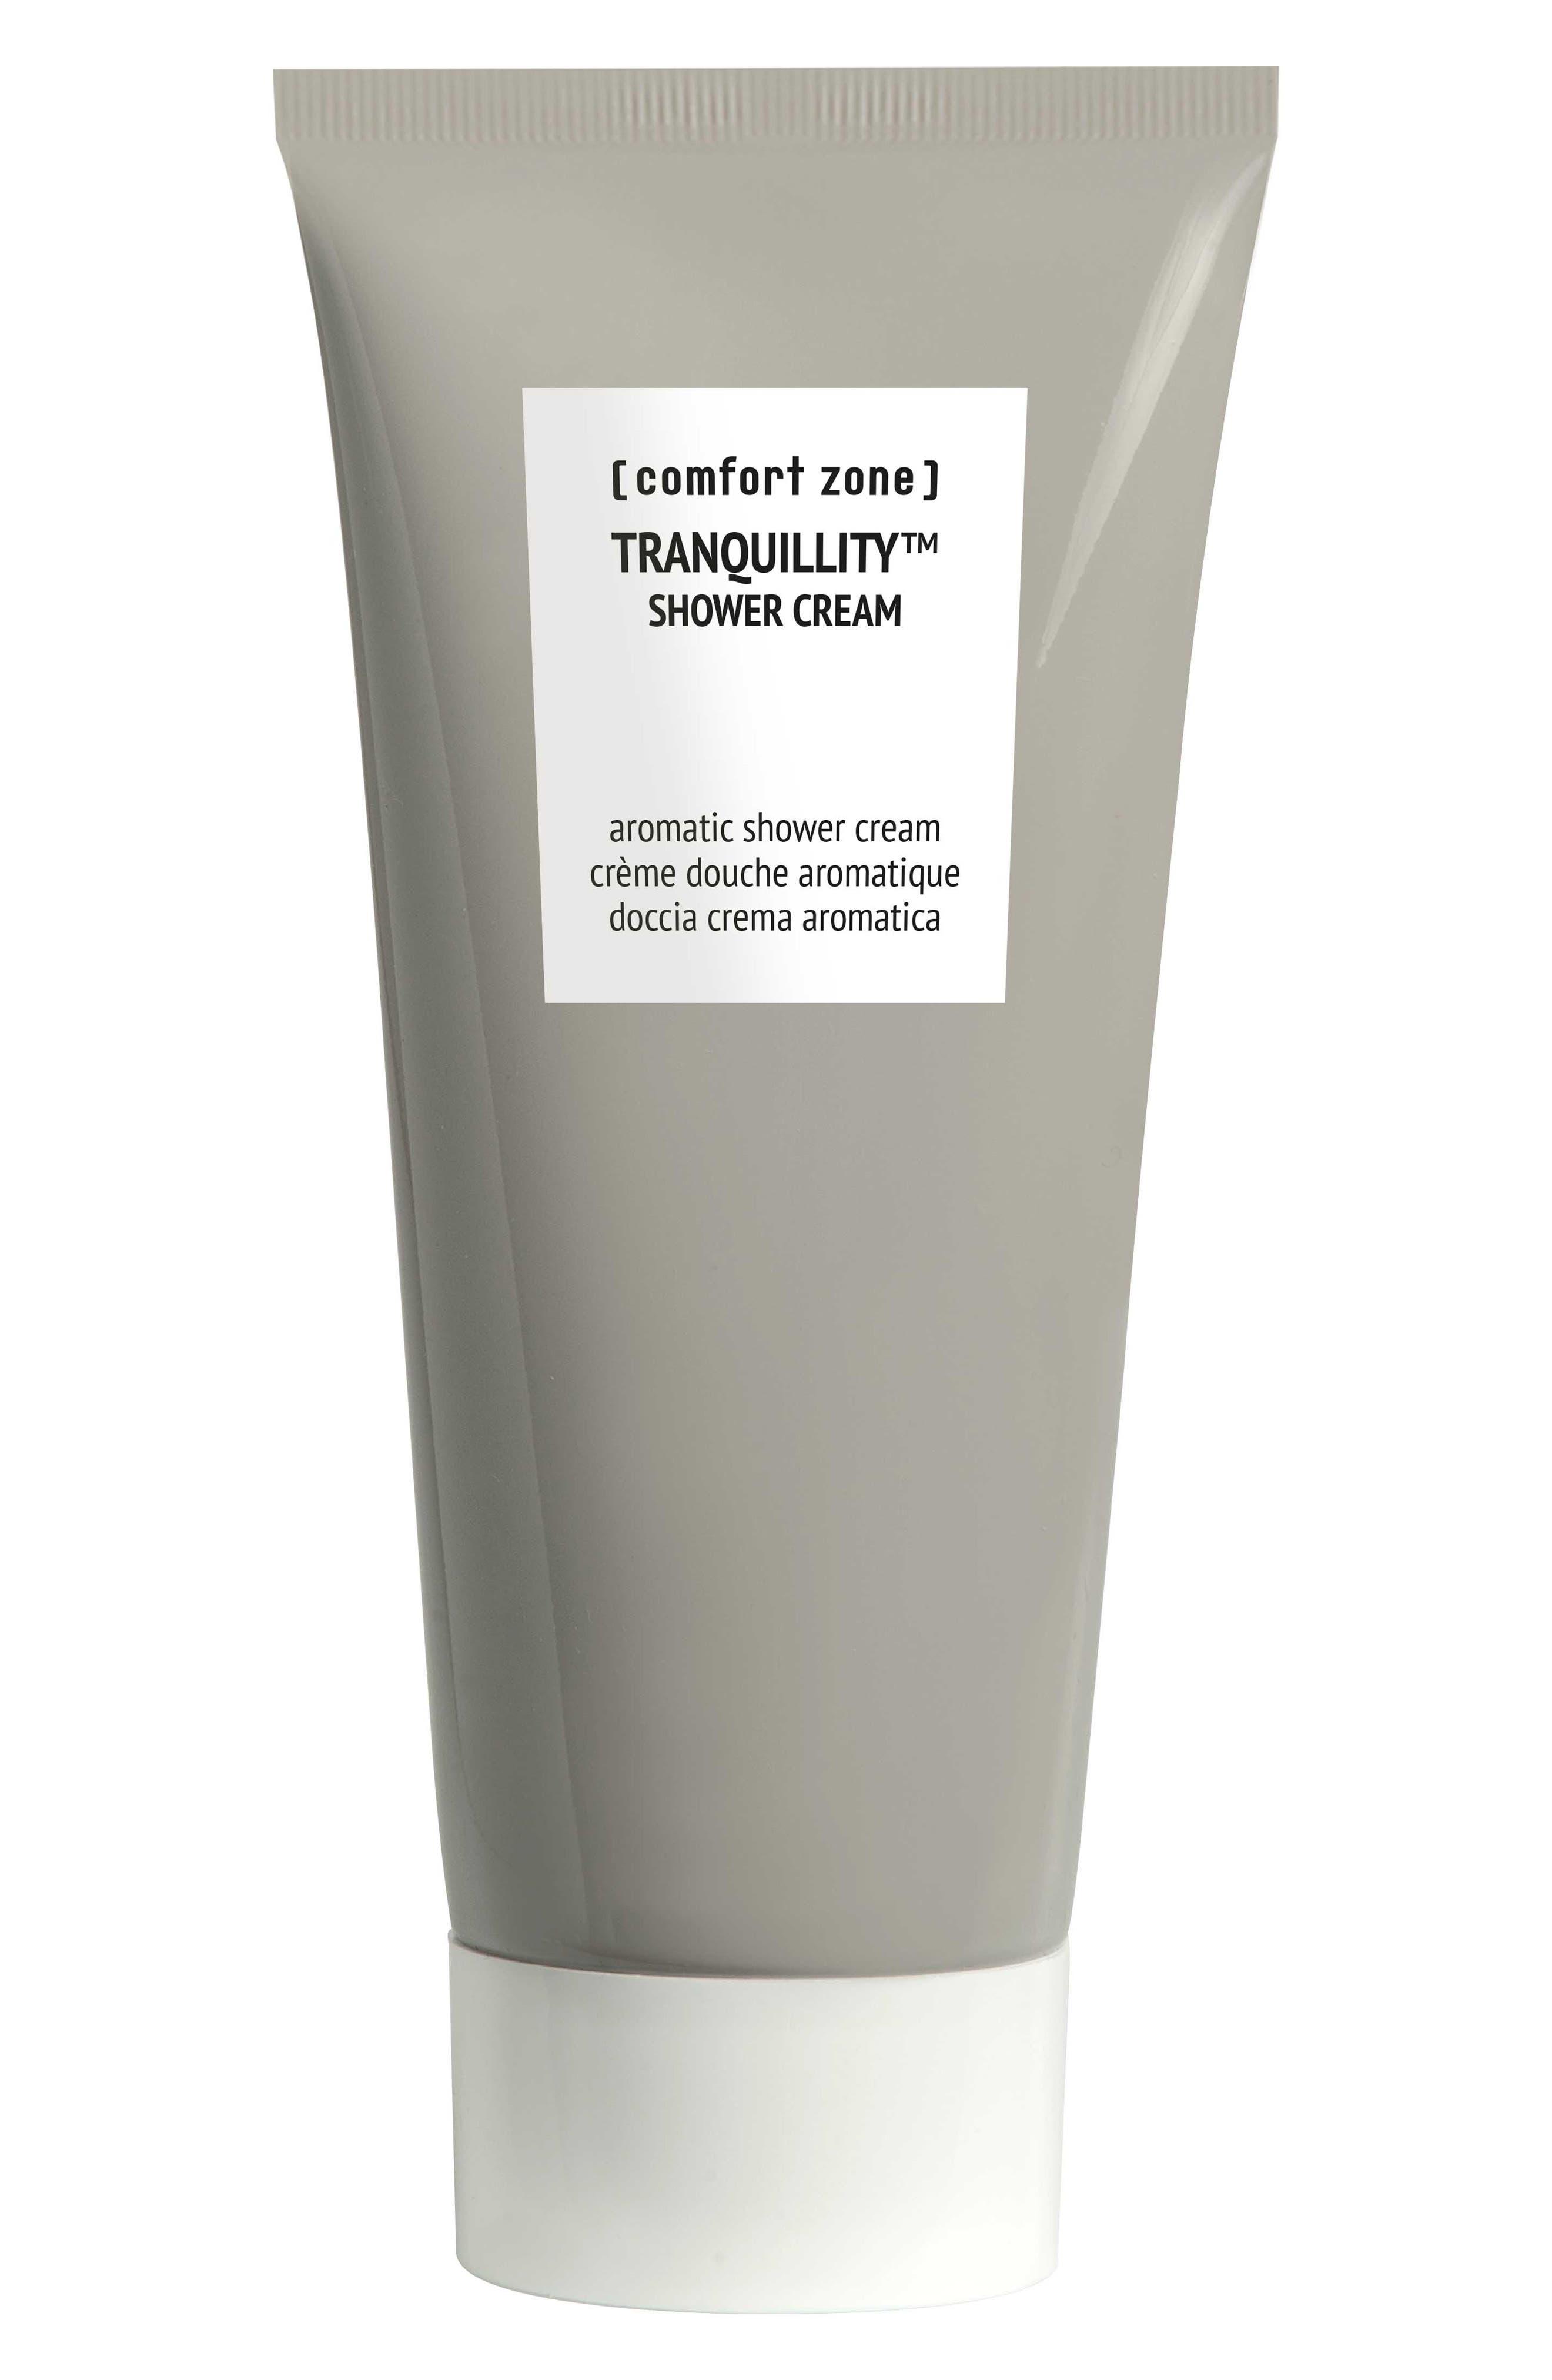 Tranquillity(TM) Shower Cream